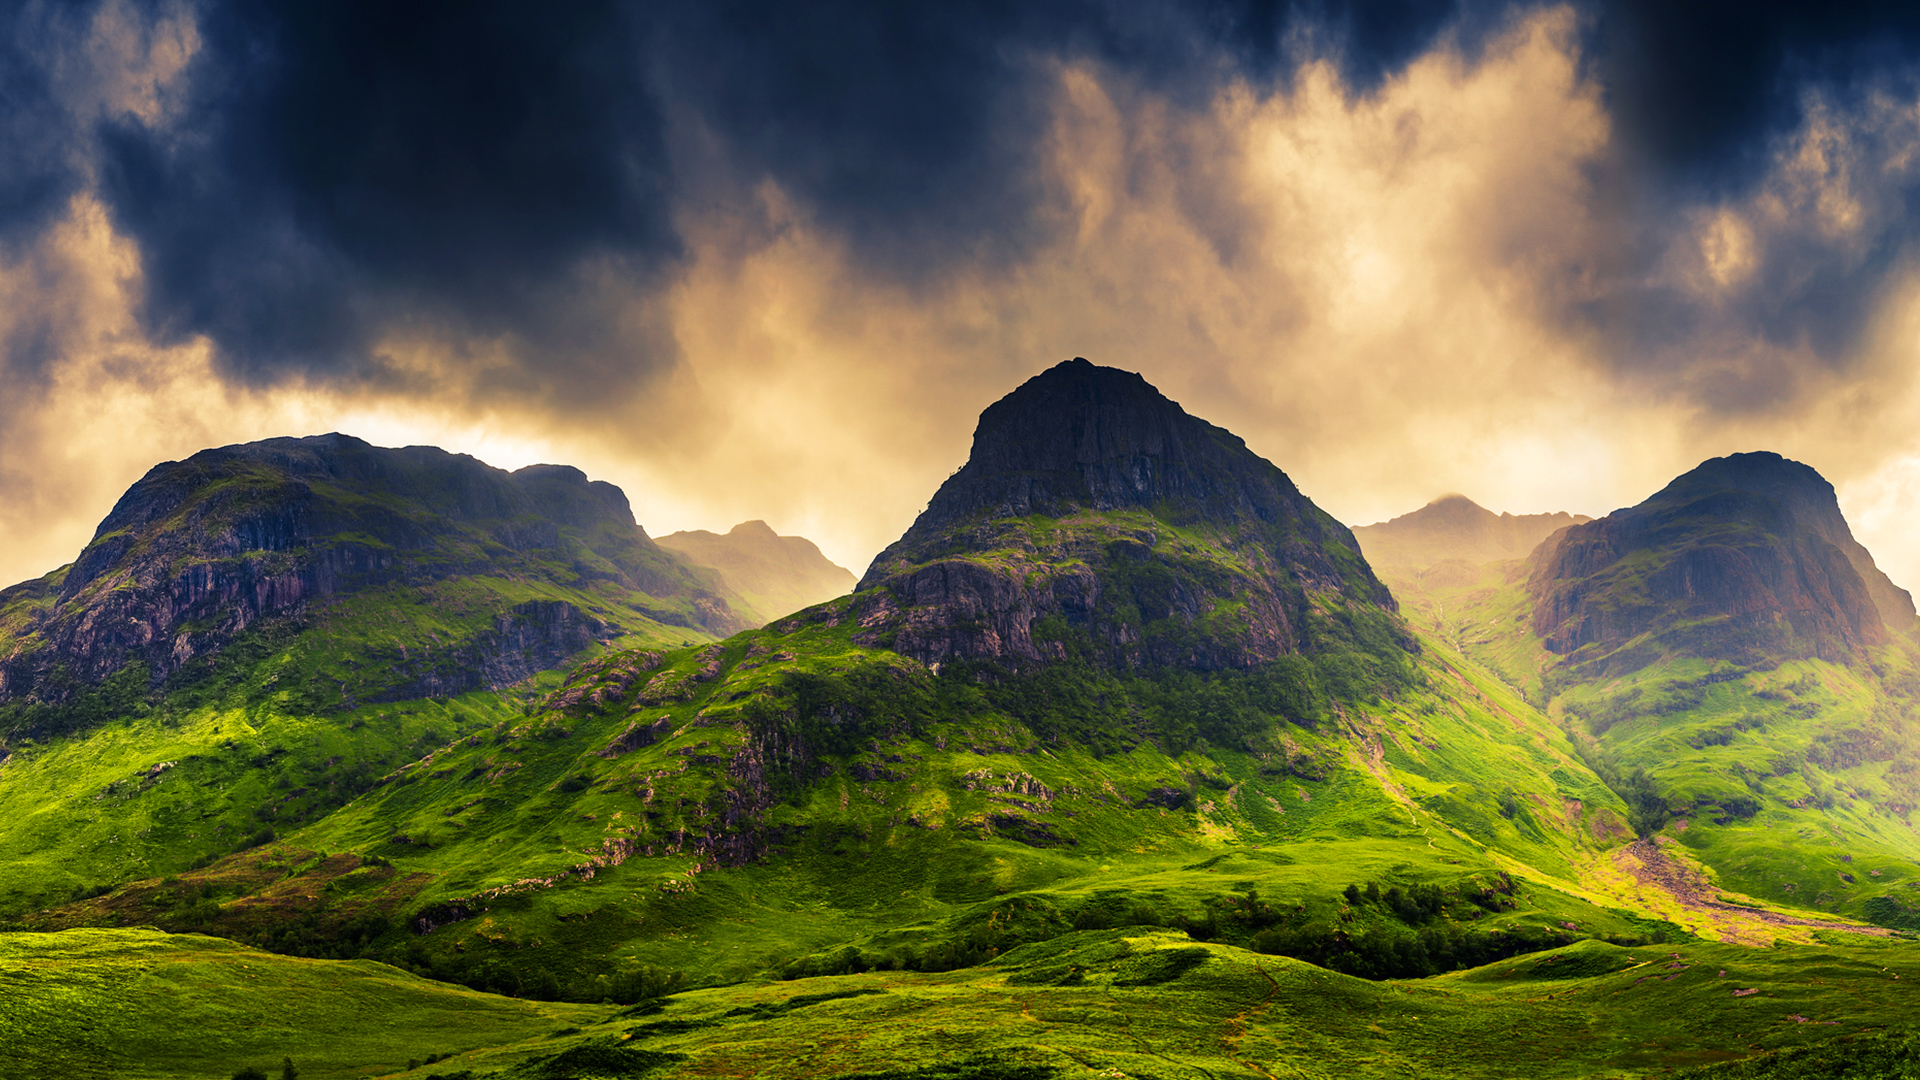 50 scotland screensavers and wallpaper on wallpapersafari - Scotland wallpaper ...